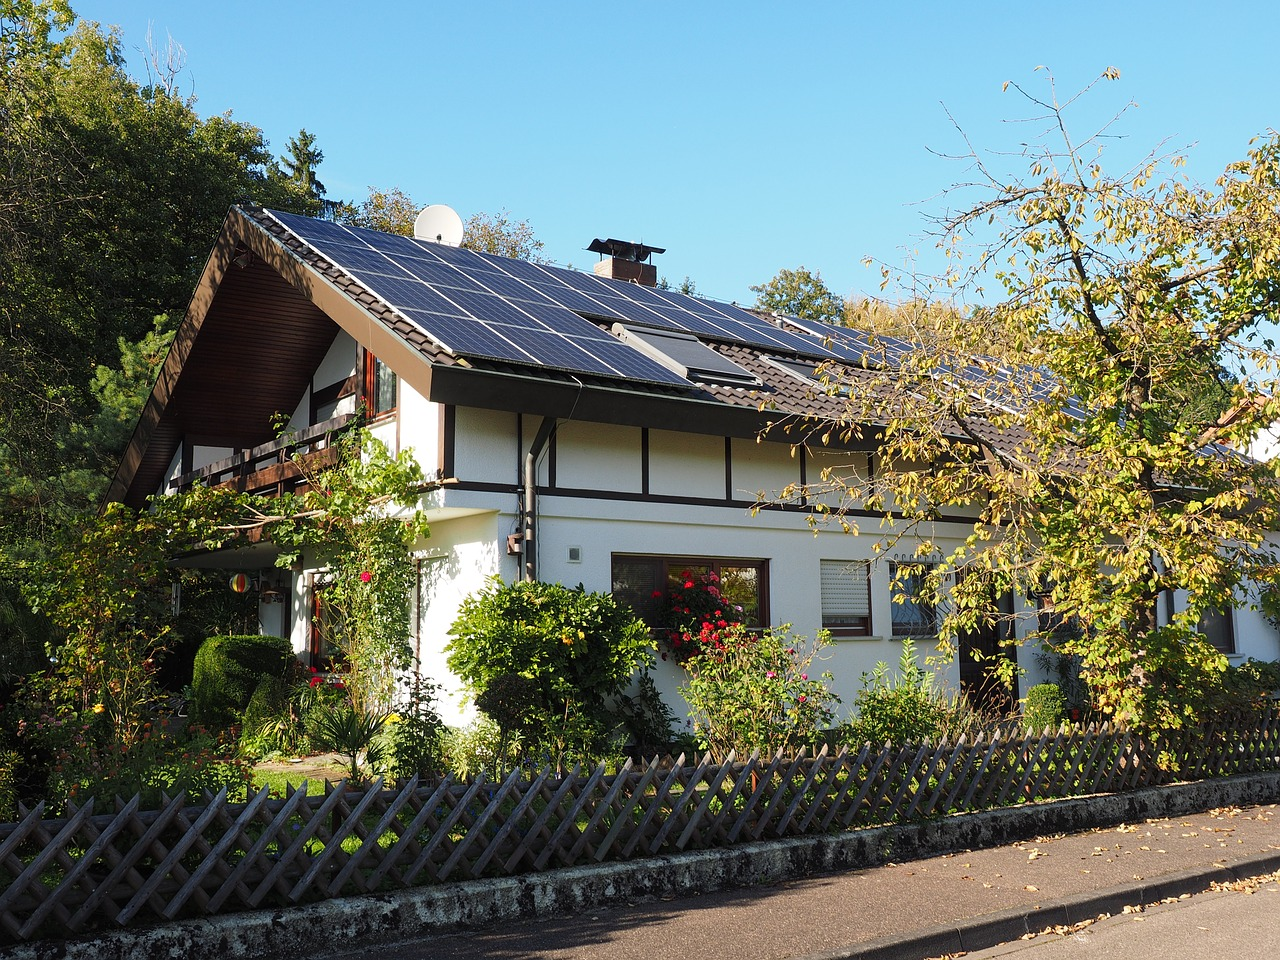 paneles solares a la arquitectura